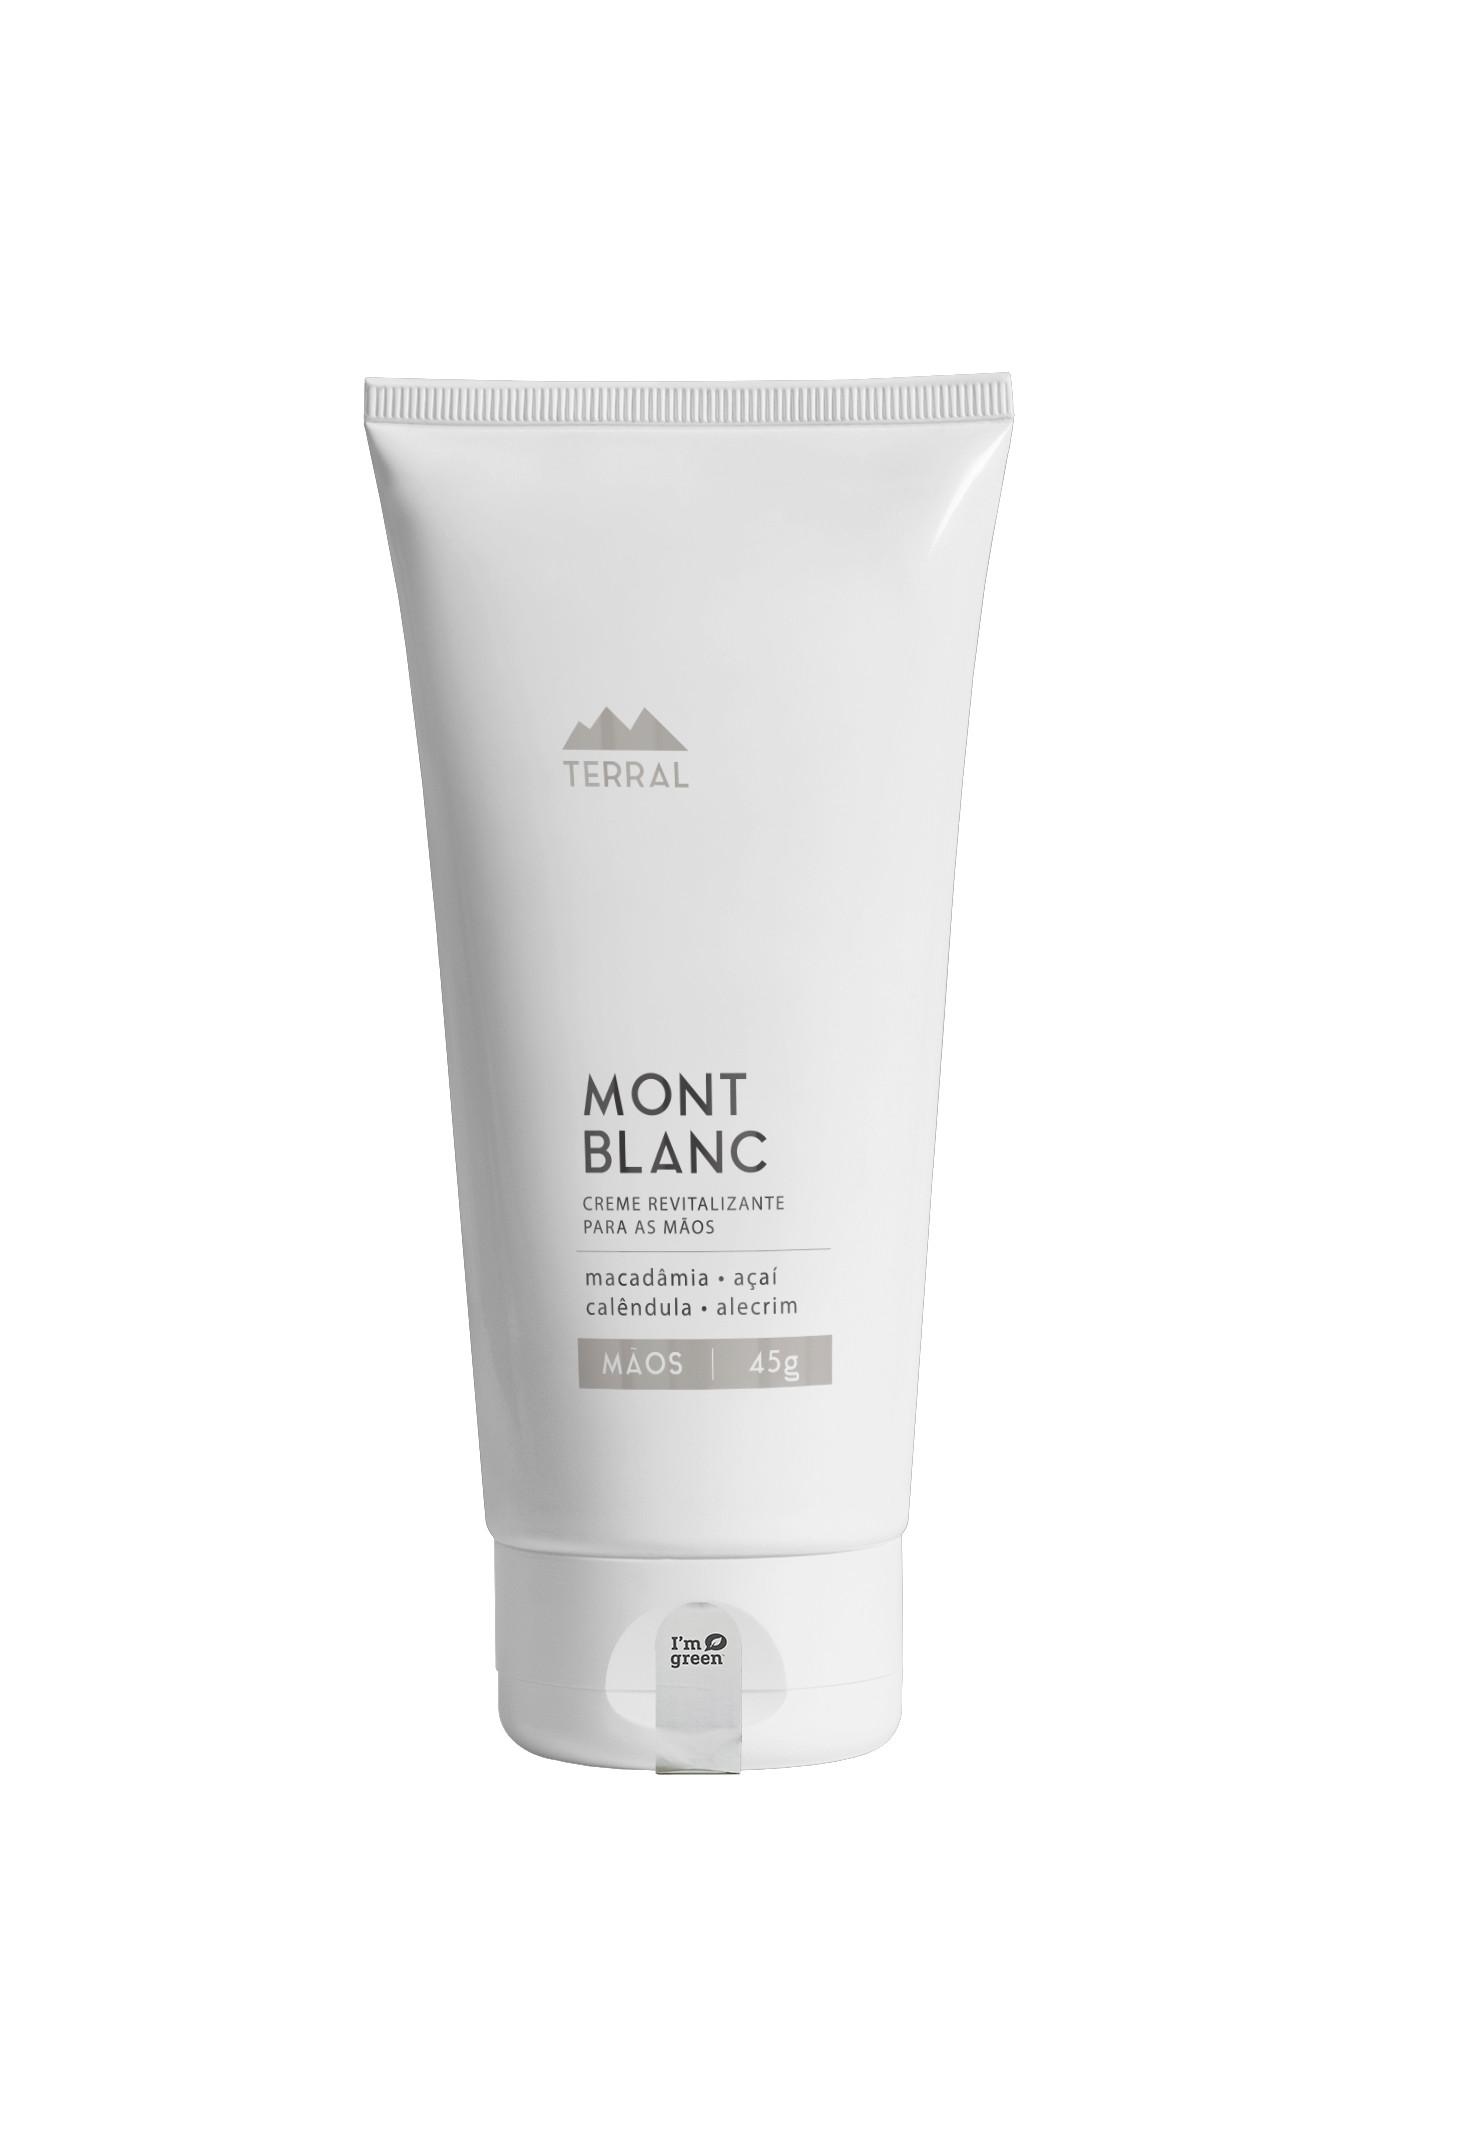 Creme para as Mãos Mont Blanc